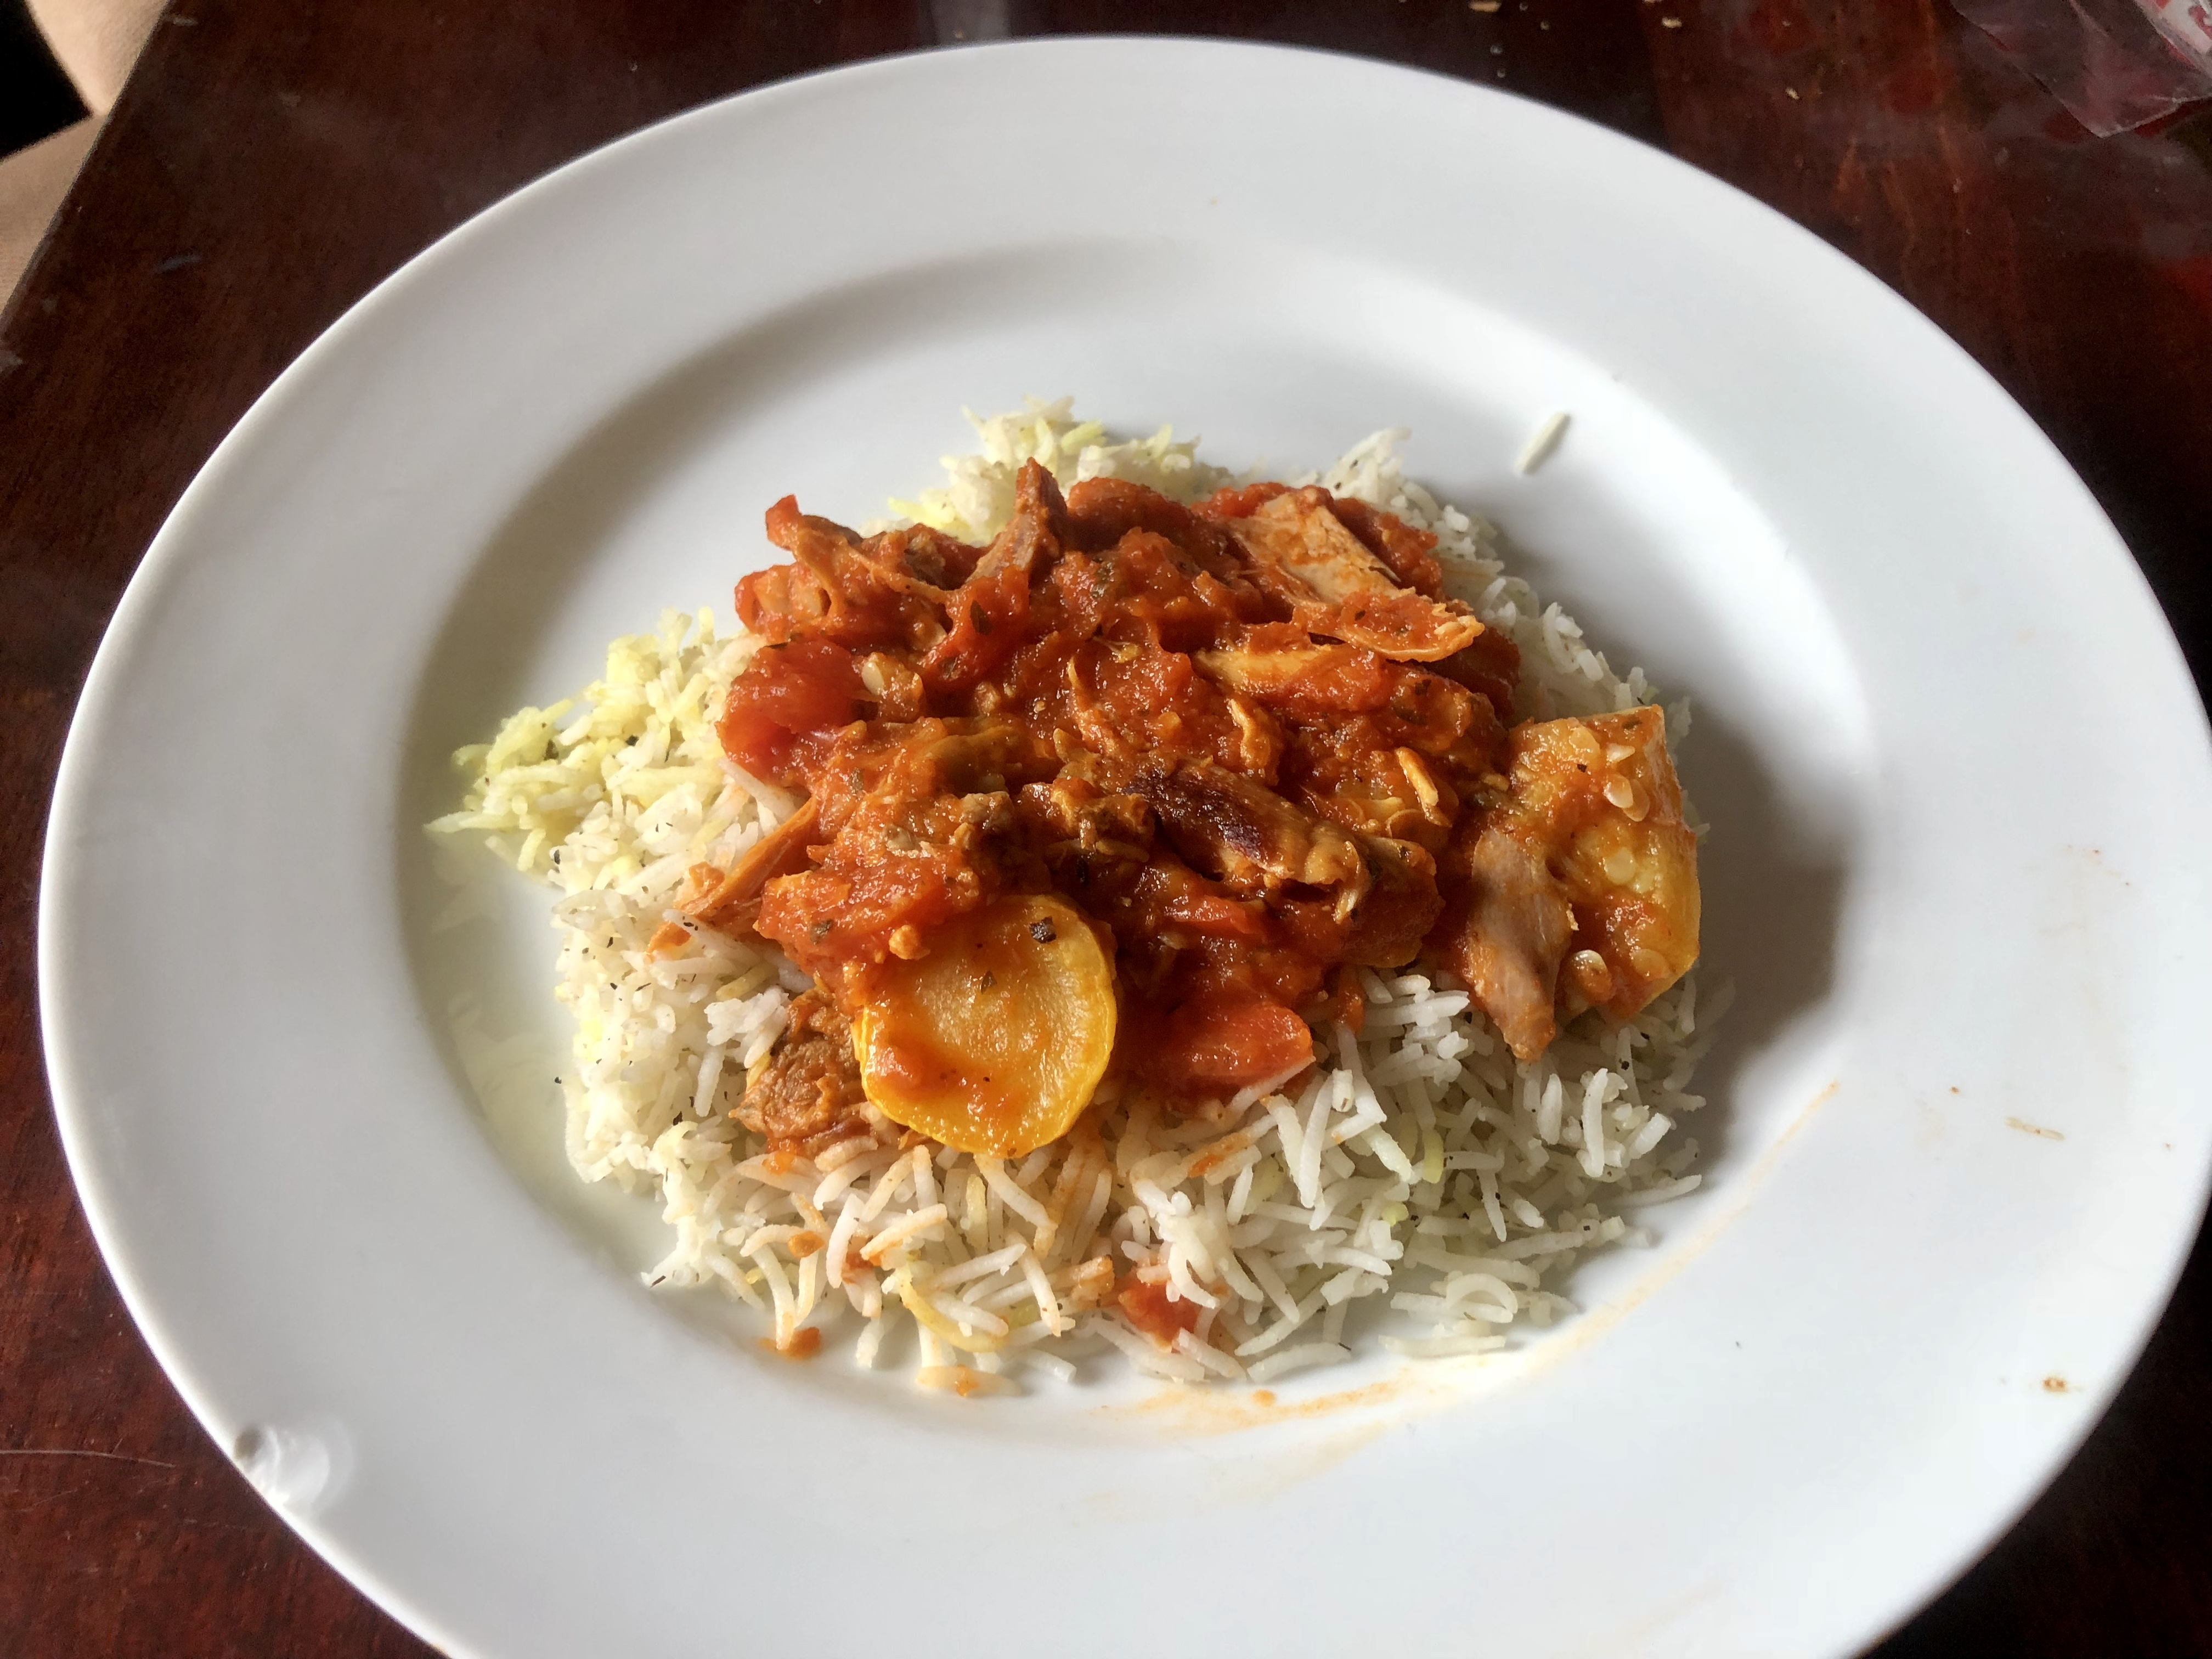 Italian Chicken and Vegetables over Rice Marsha Pierce